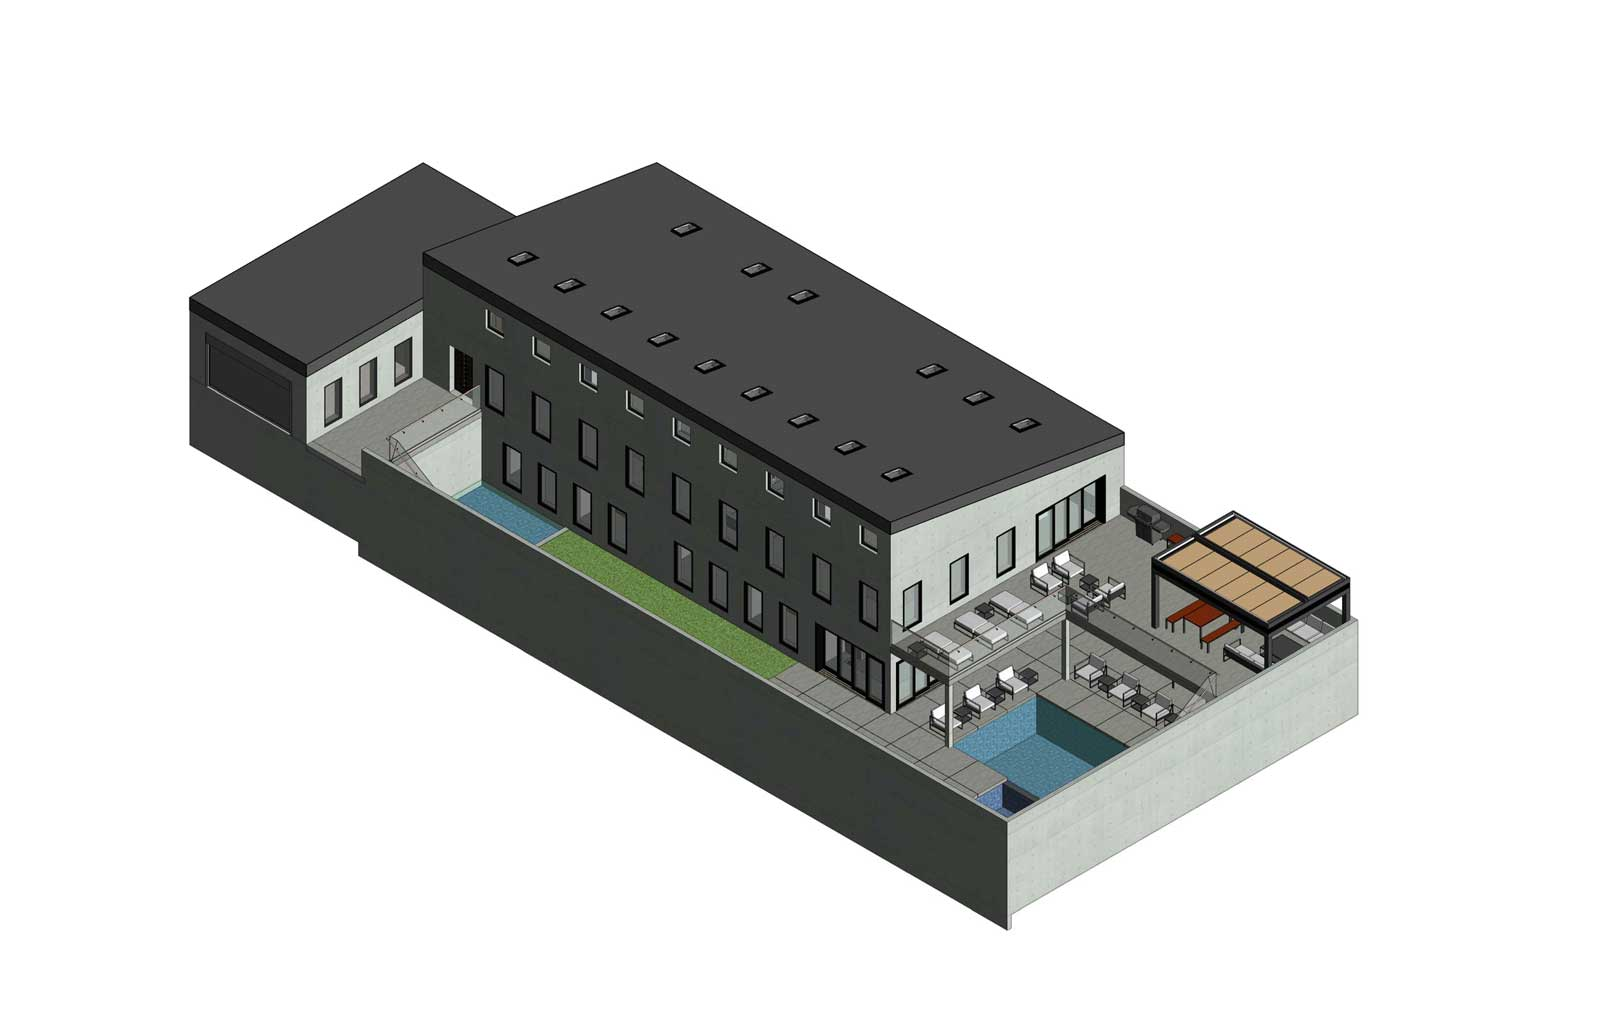 17x30 - Single Family High End Residence - Axon Sketch